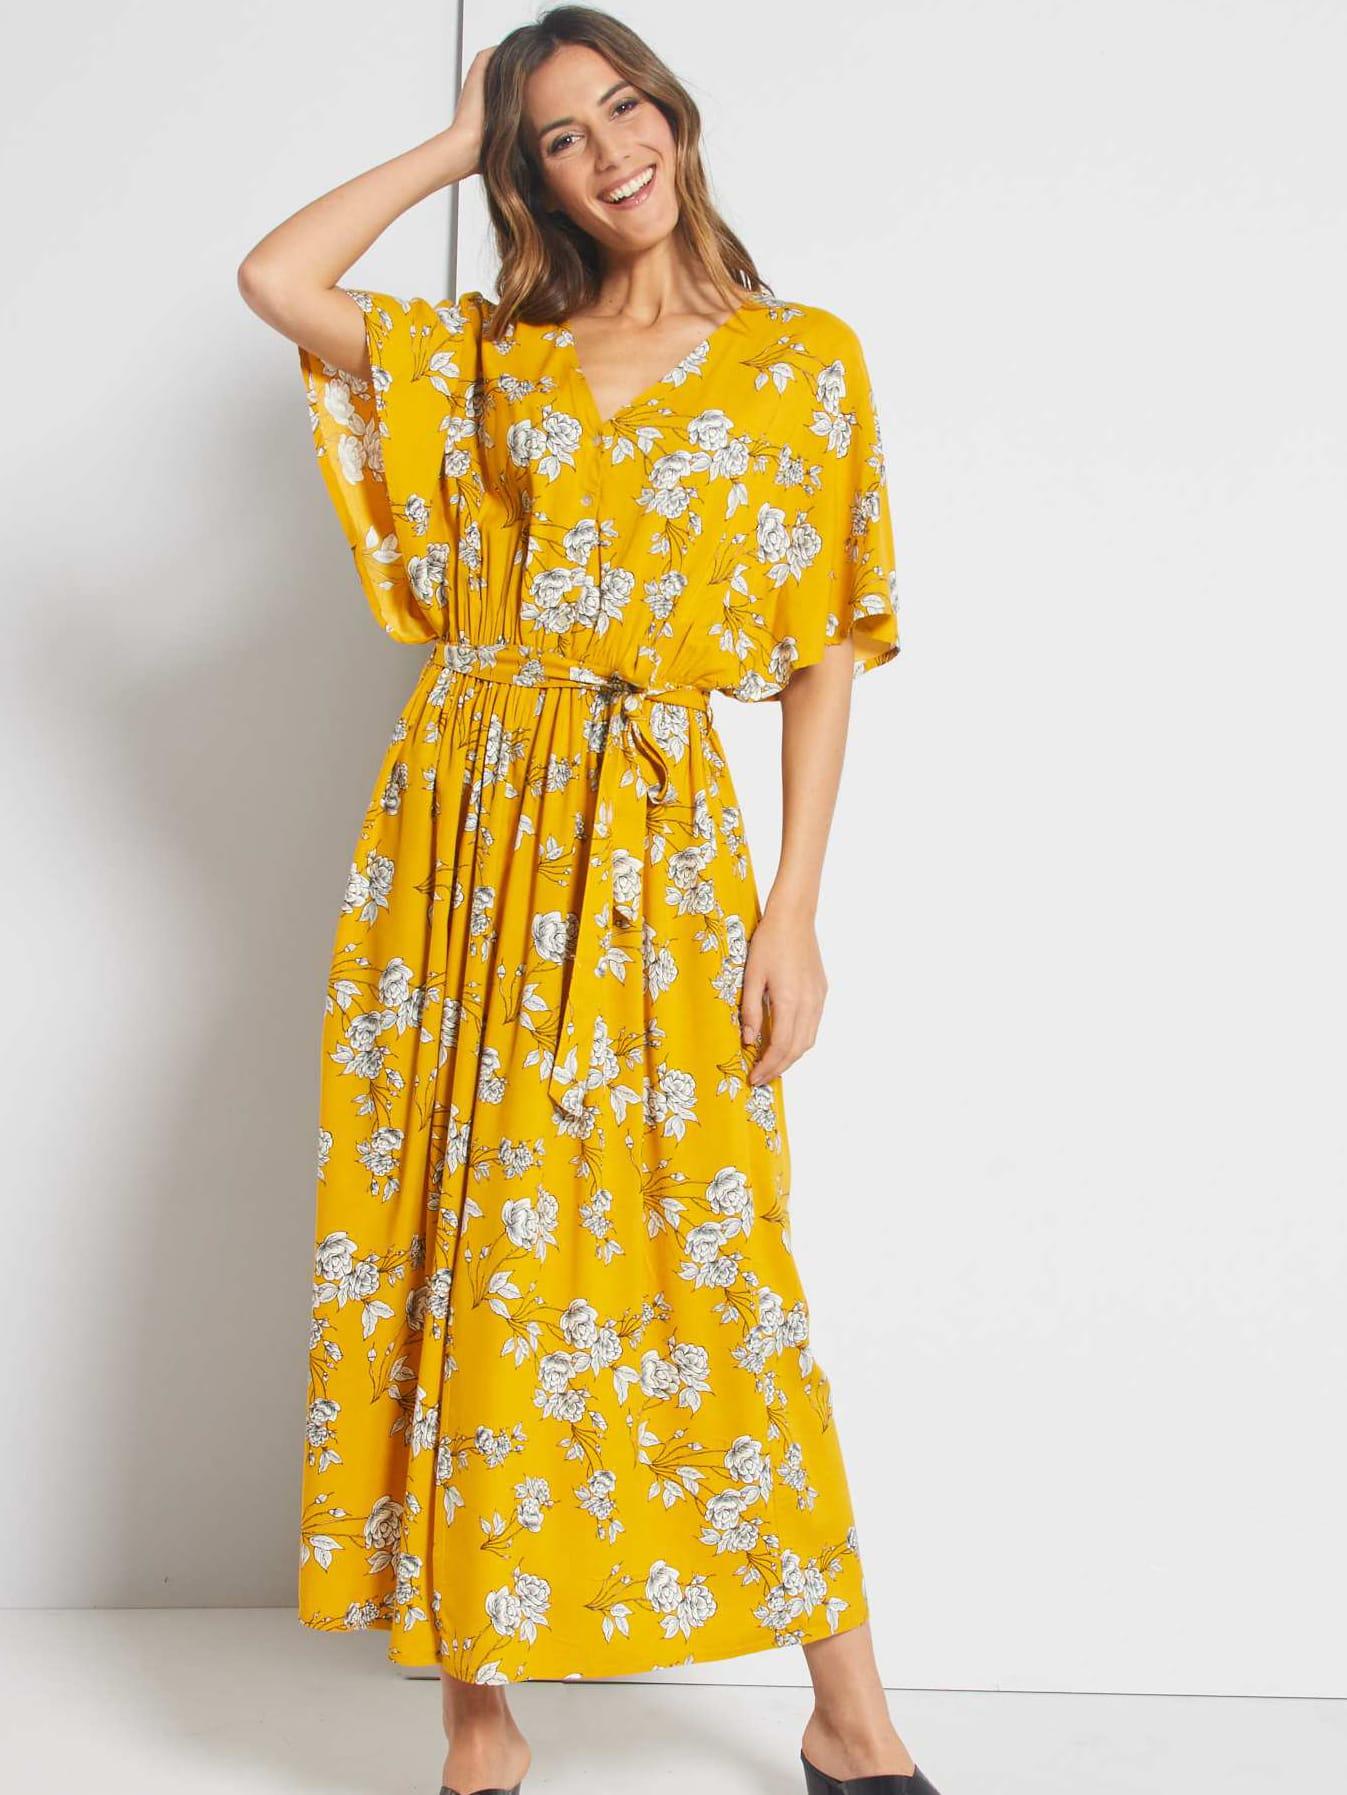 Robe Longue Fleurie De Kiabi